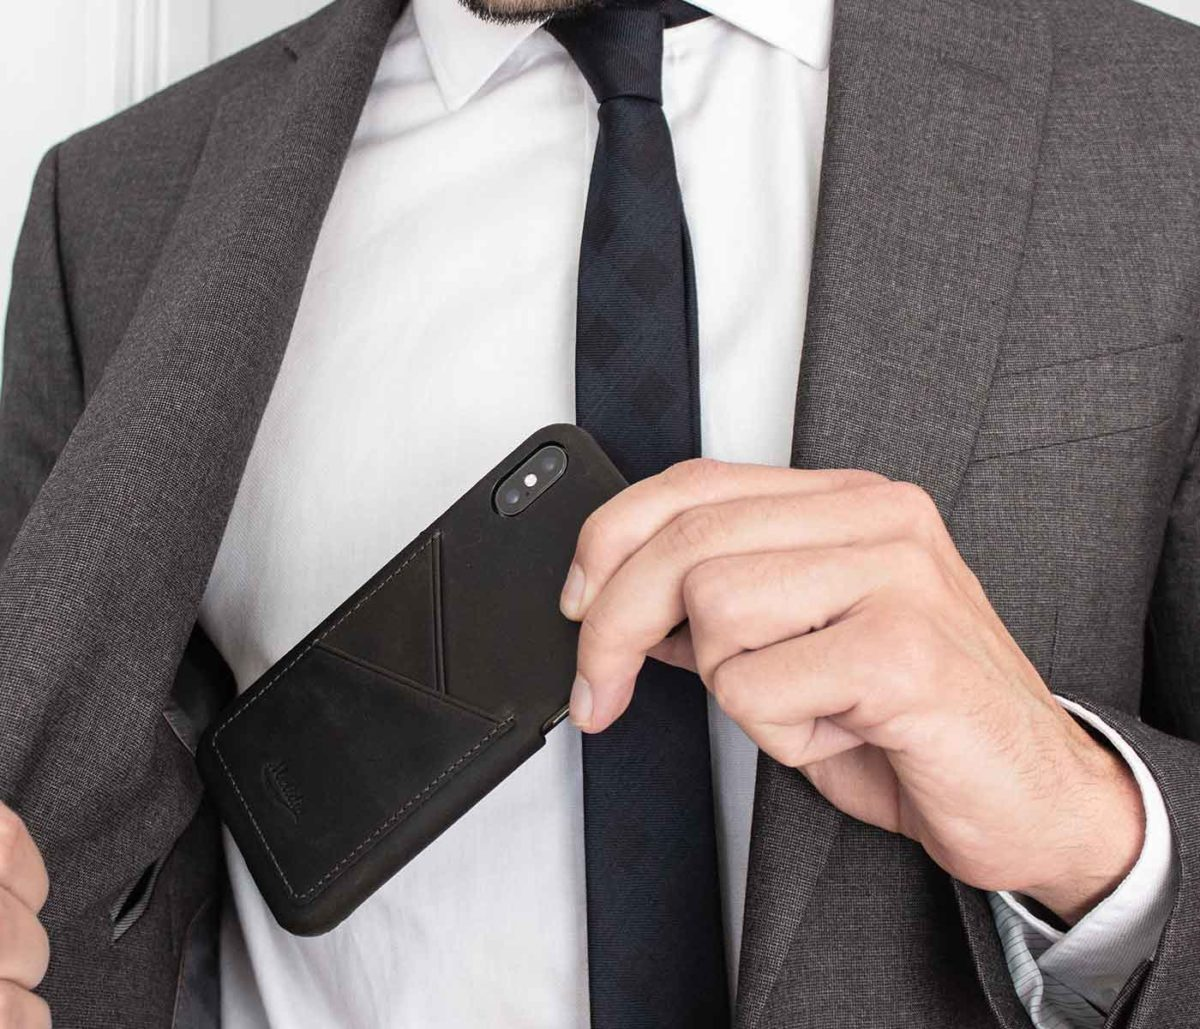 Carbon-core-Iphone-dark-grey-case-inside-a-jacket-pocket-bs